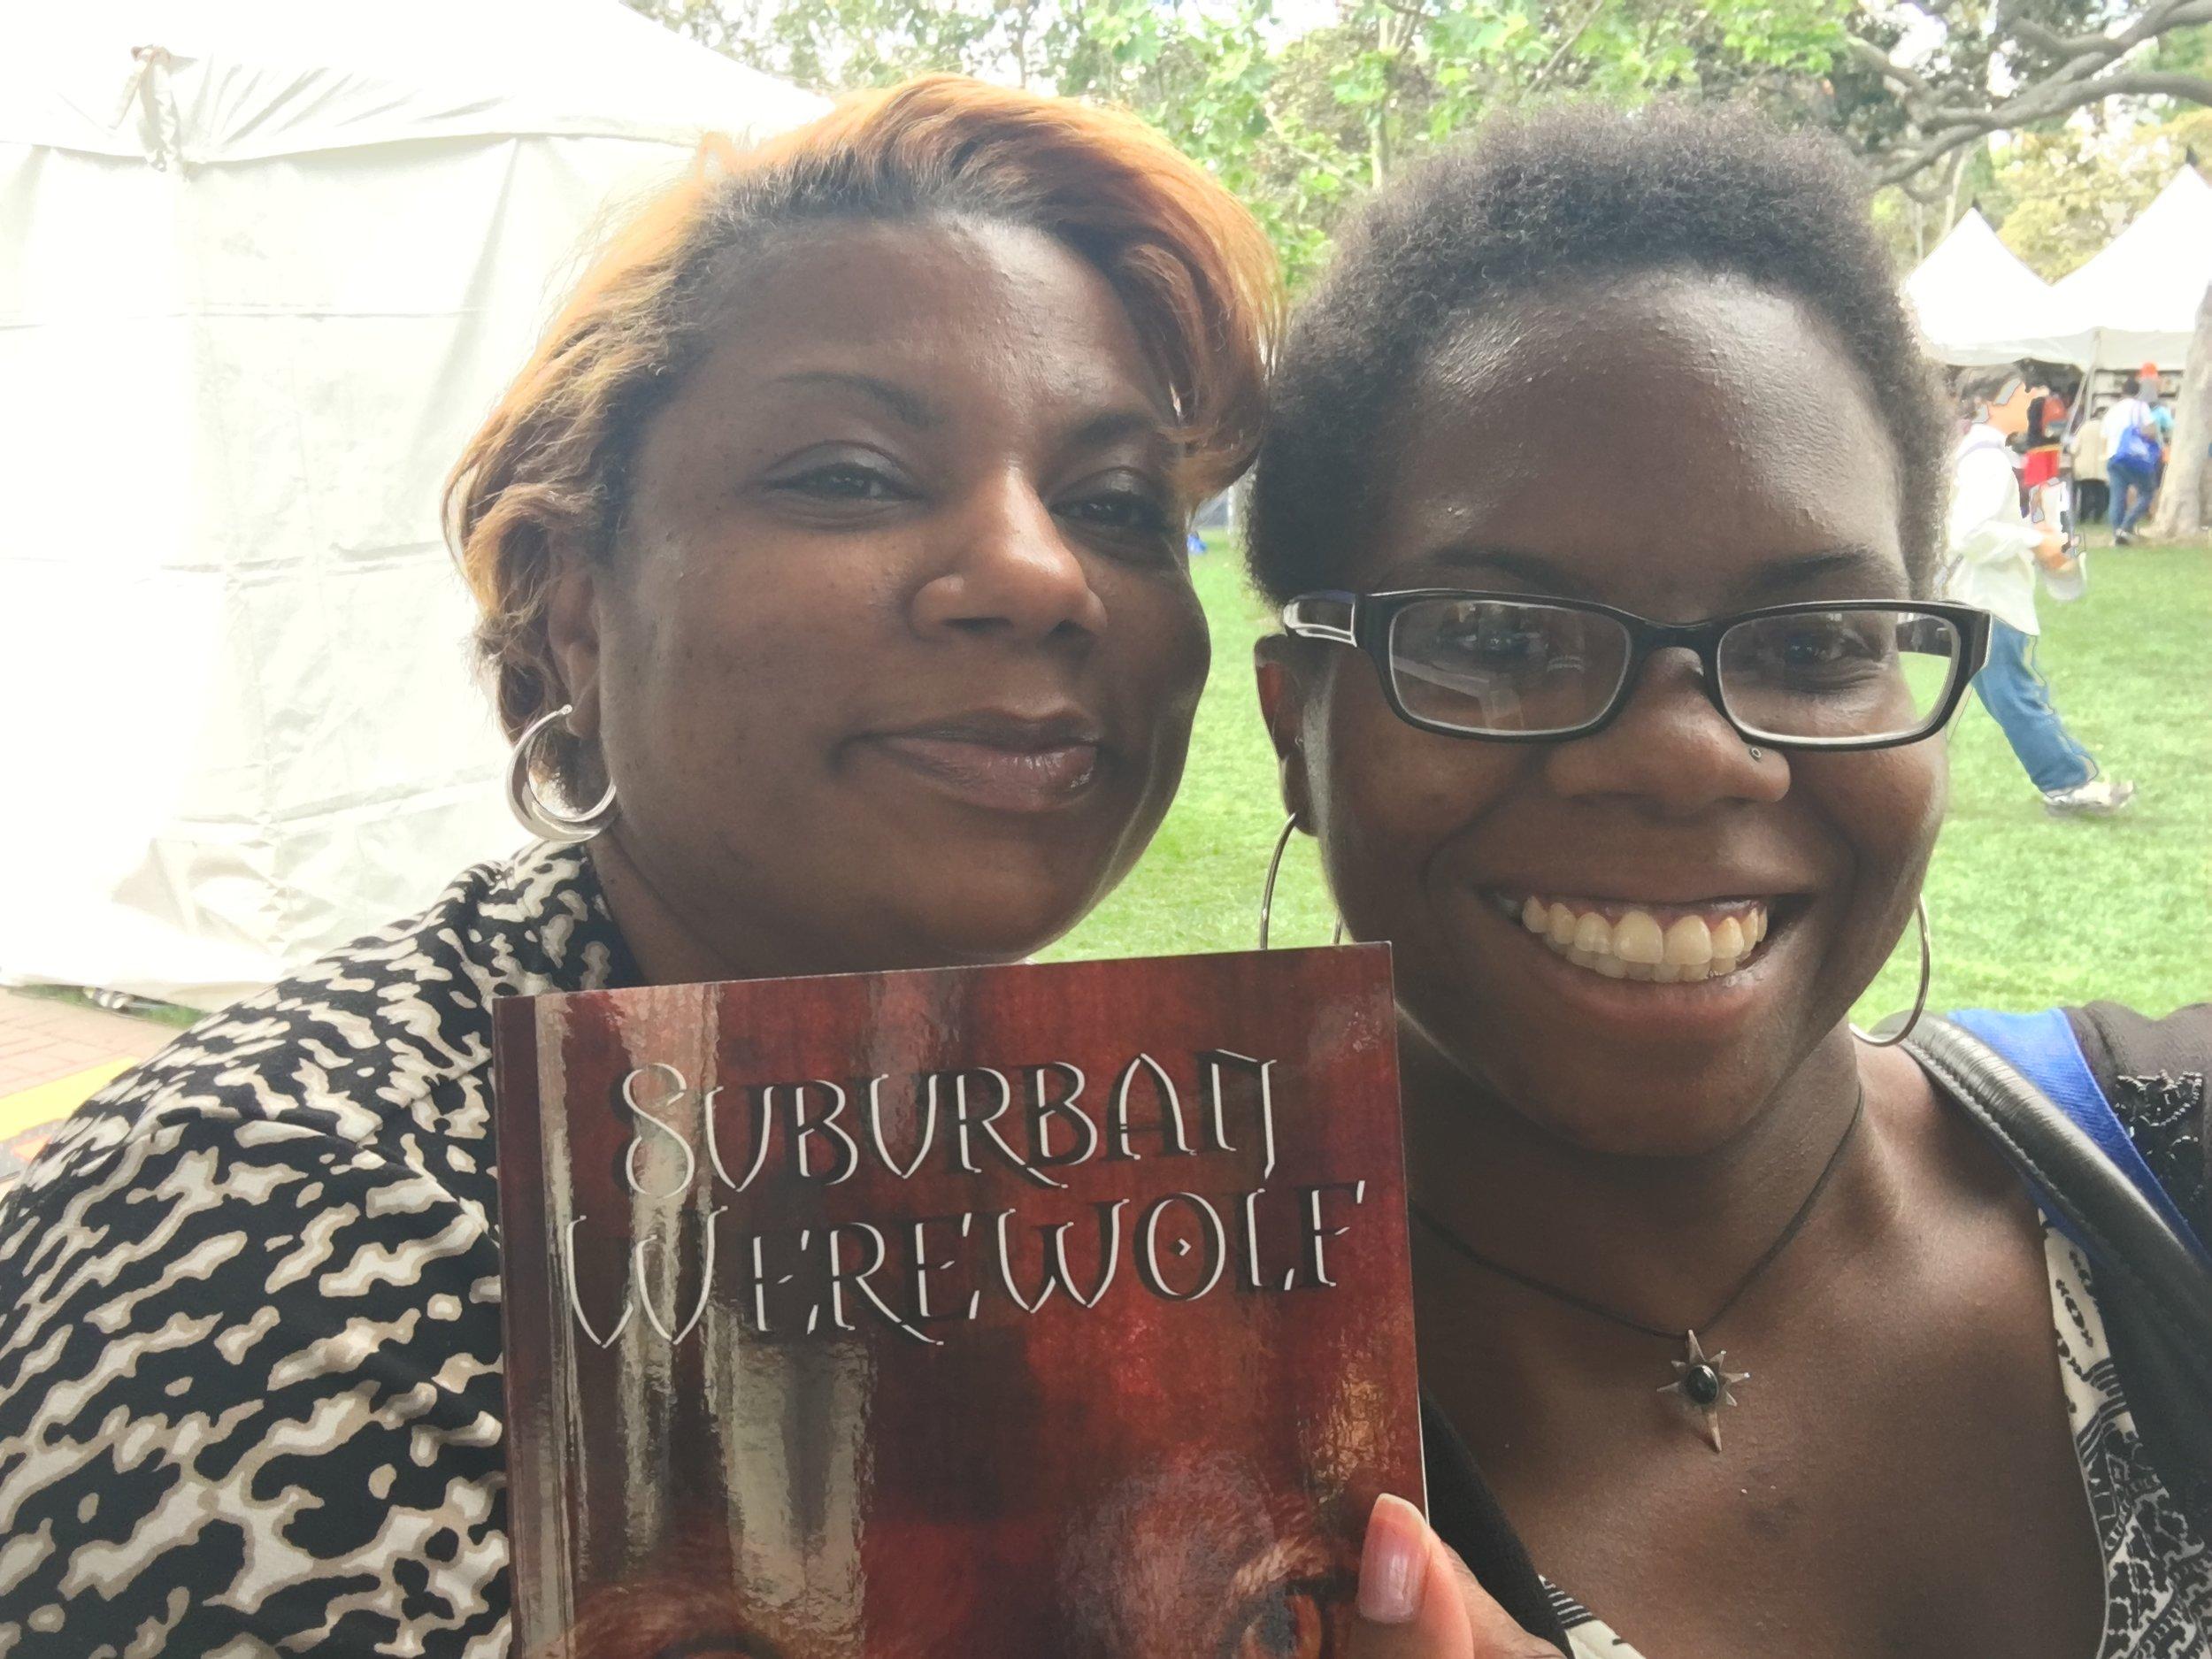 S.L. Ladd, author of  Suburban Werewolf